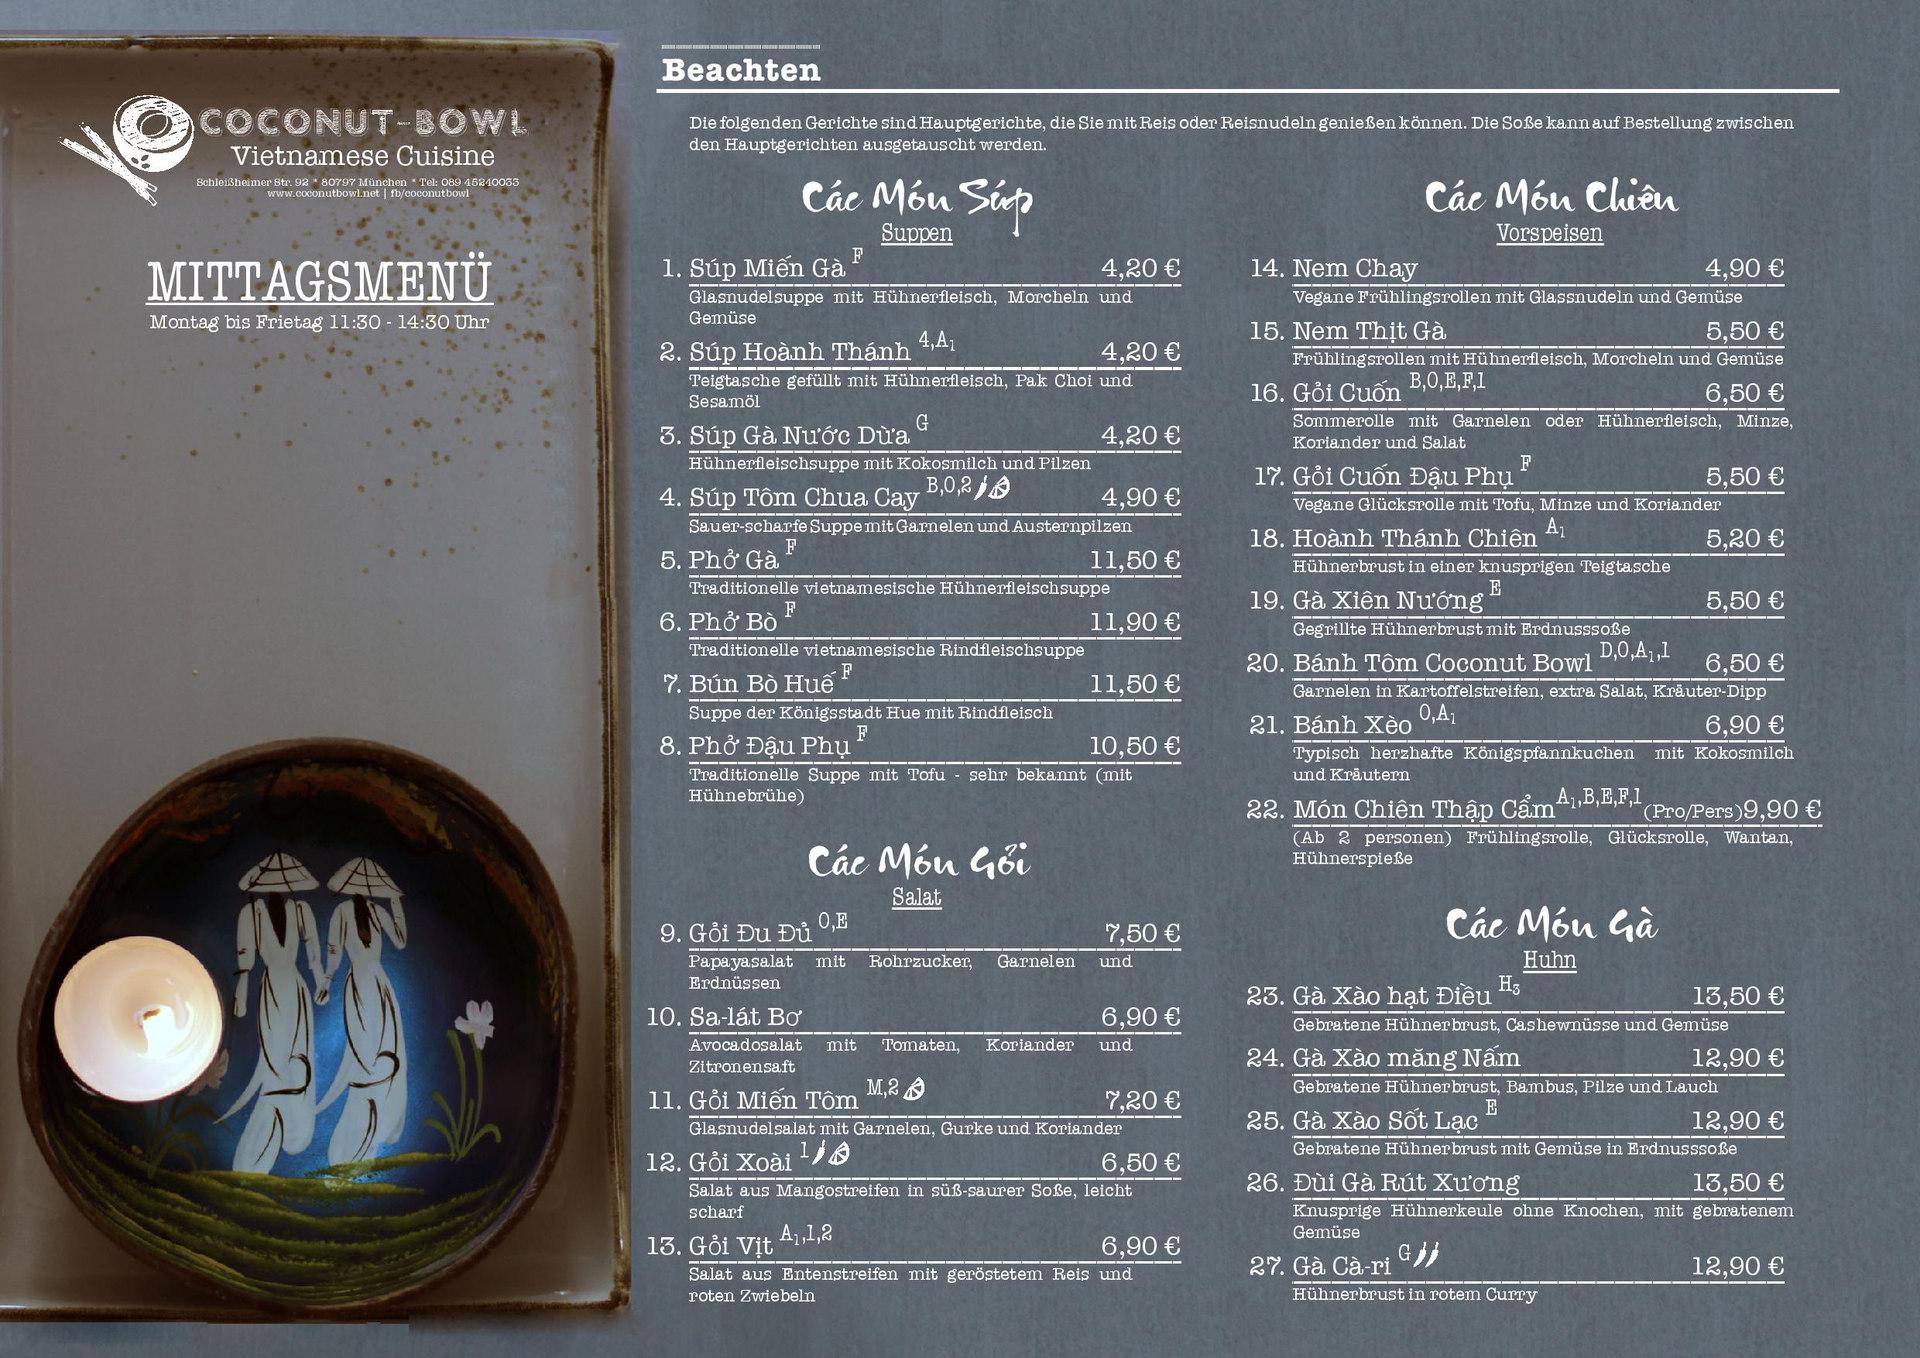 menu door-page-001.jpg